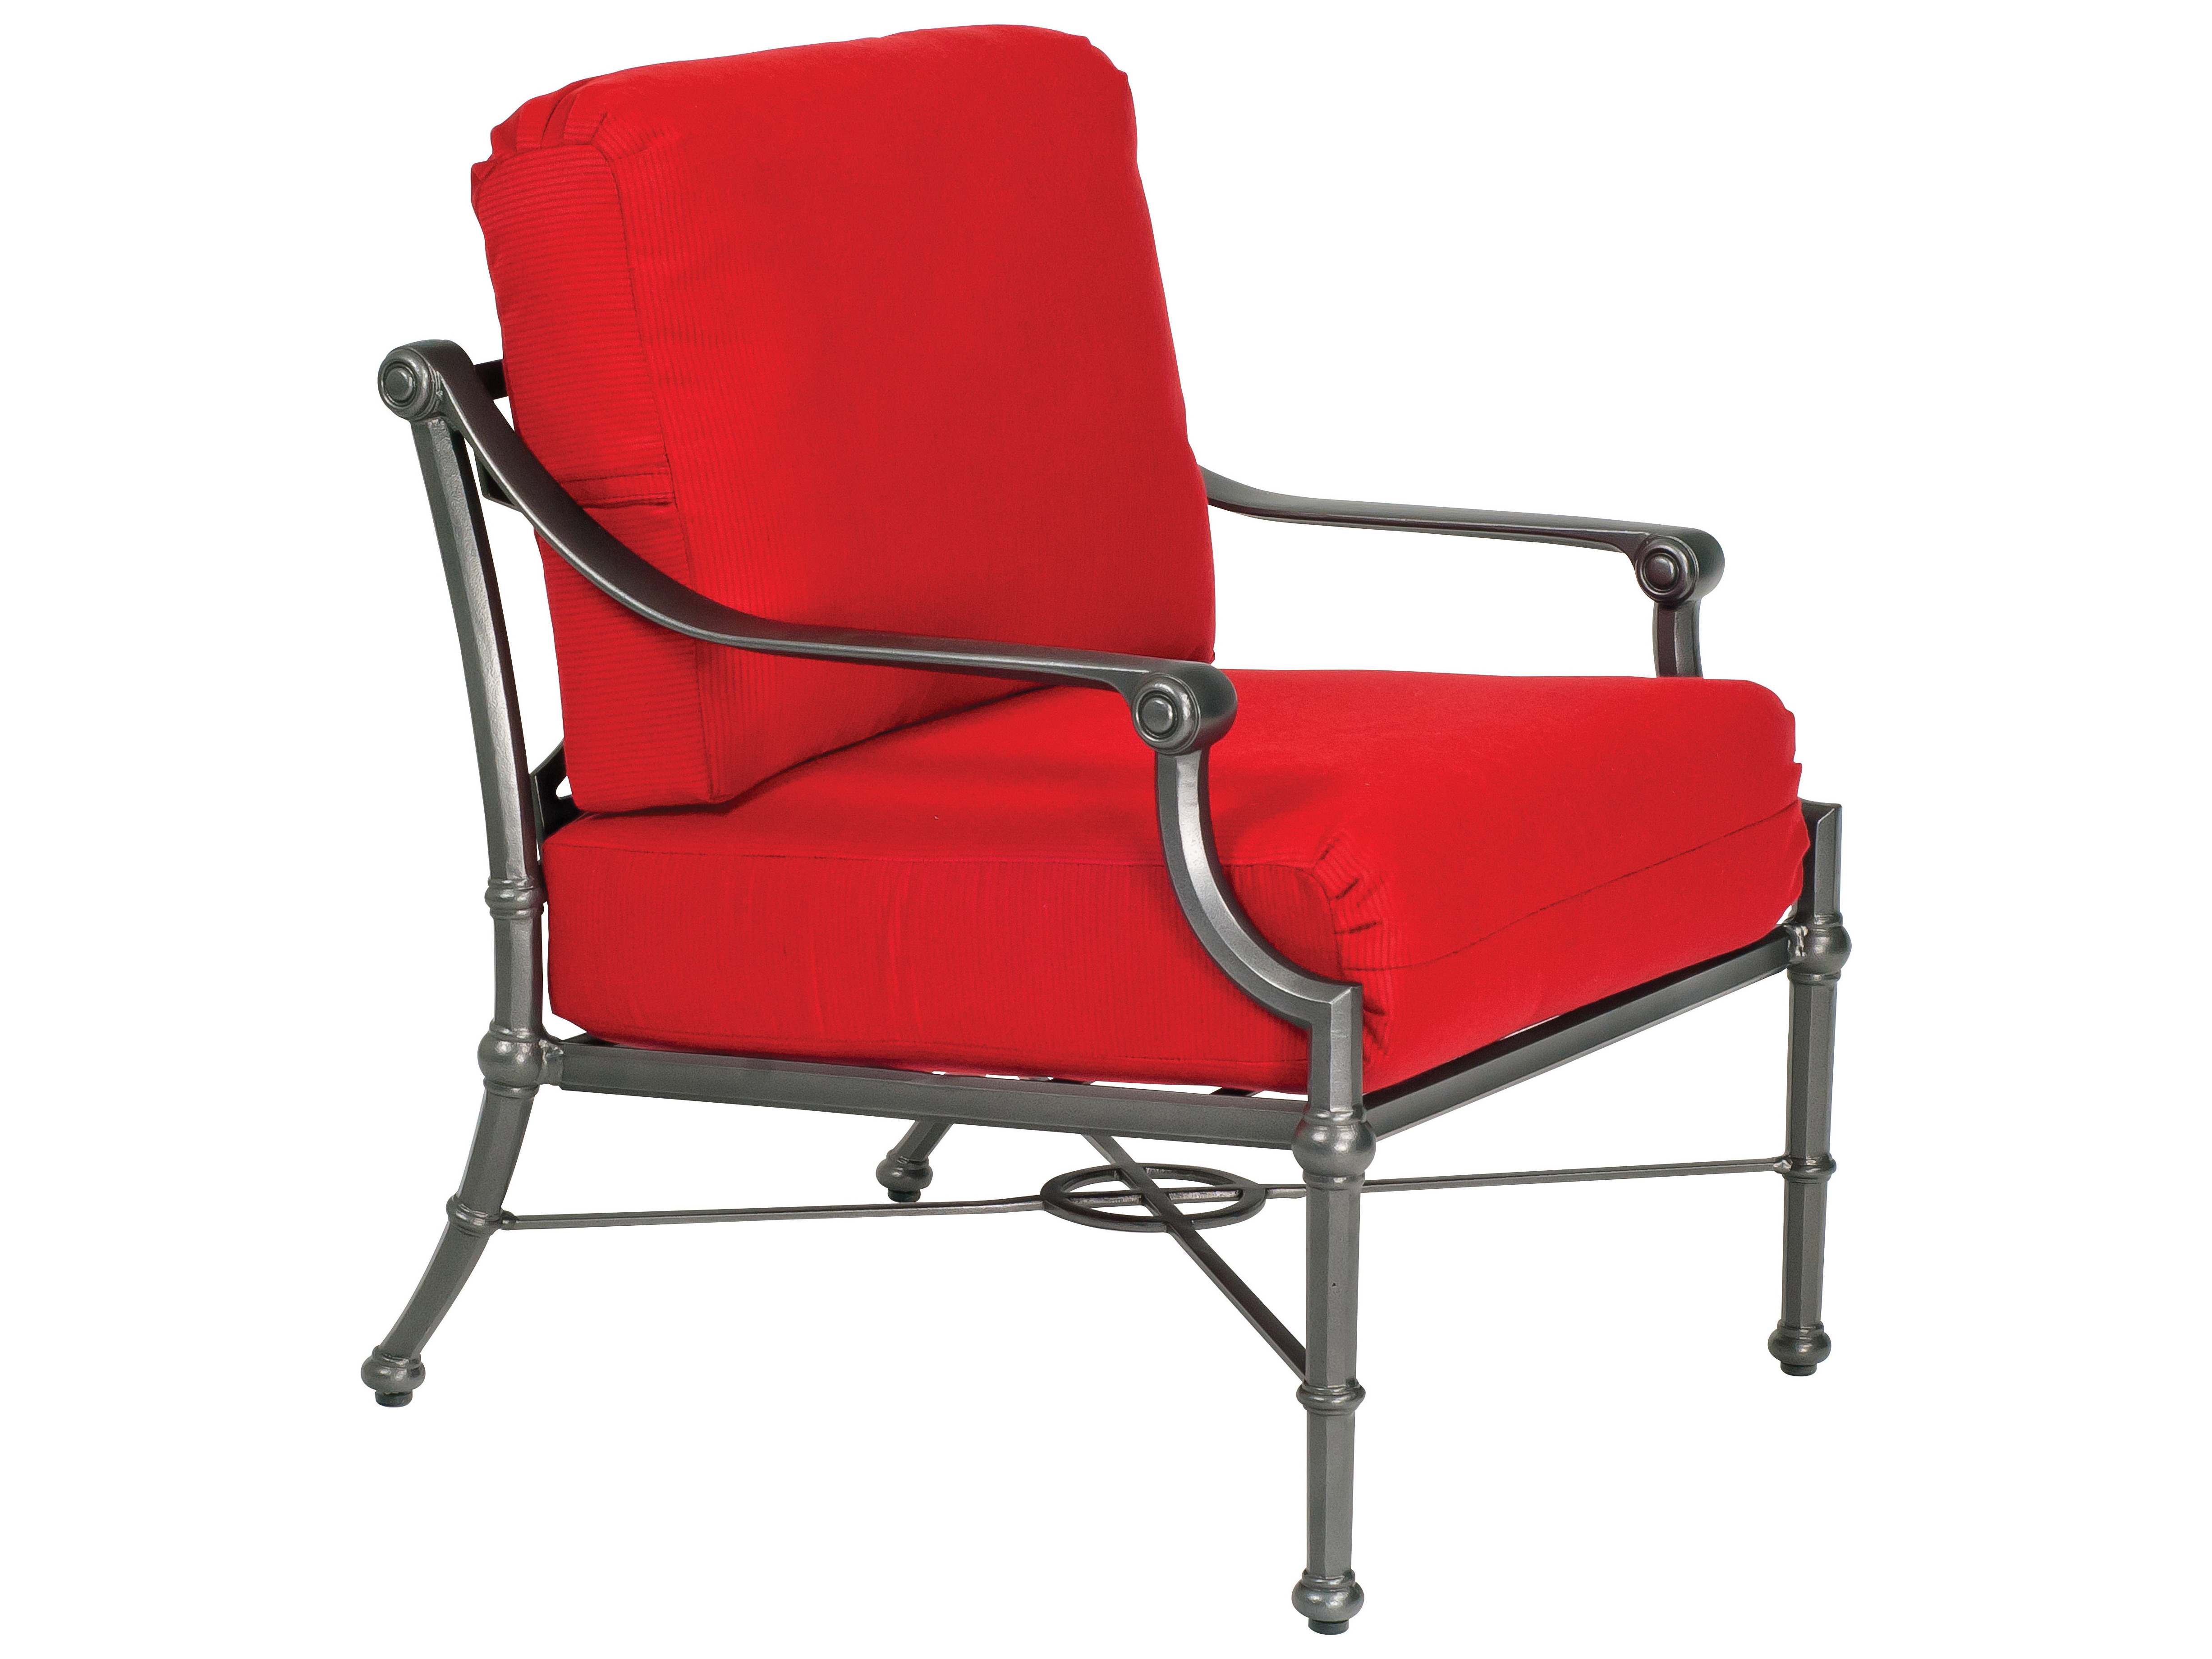 Woodard Delphi Lounge Chair Replacement Cushions